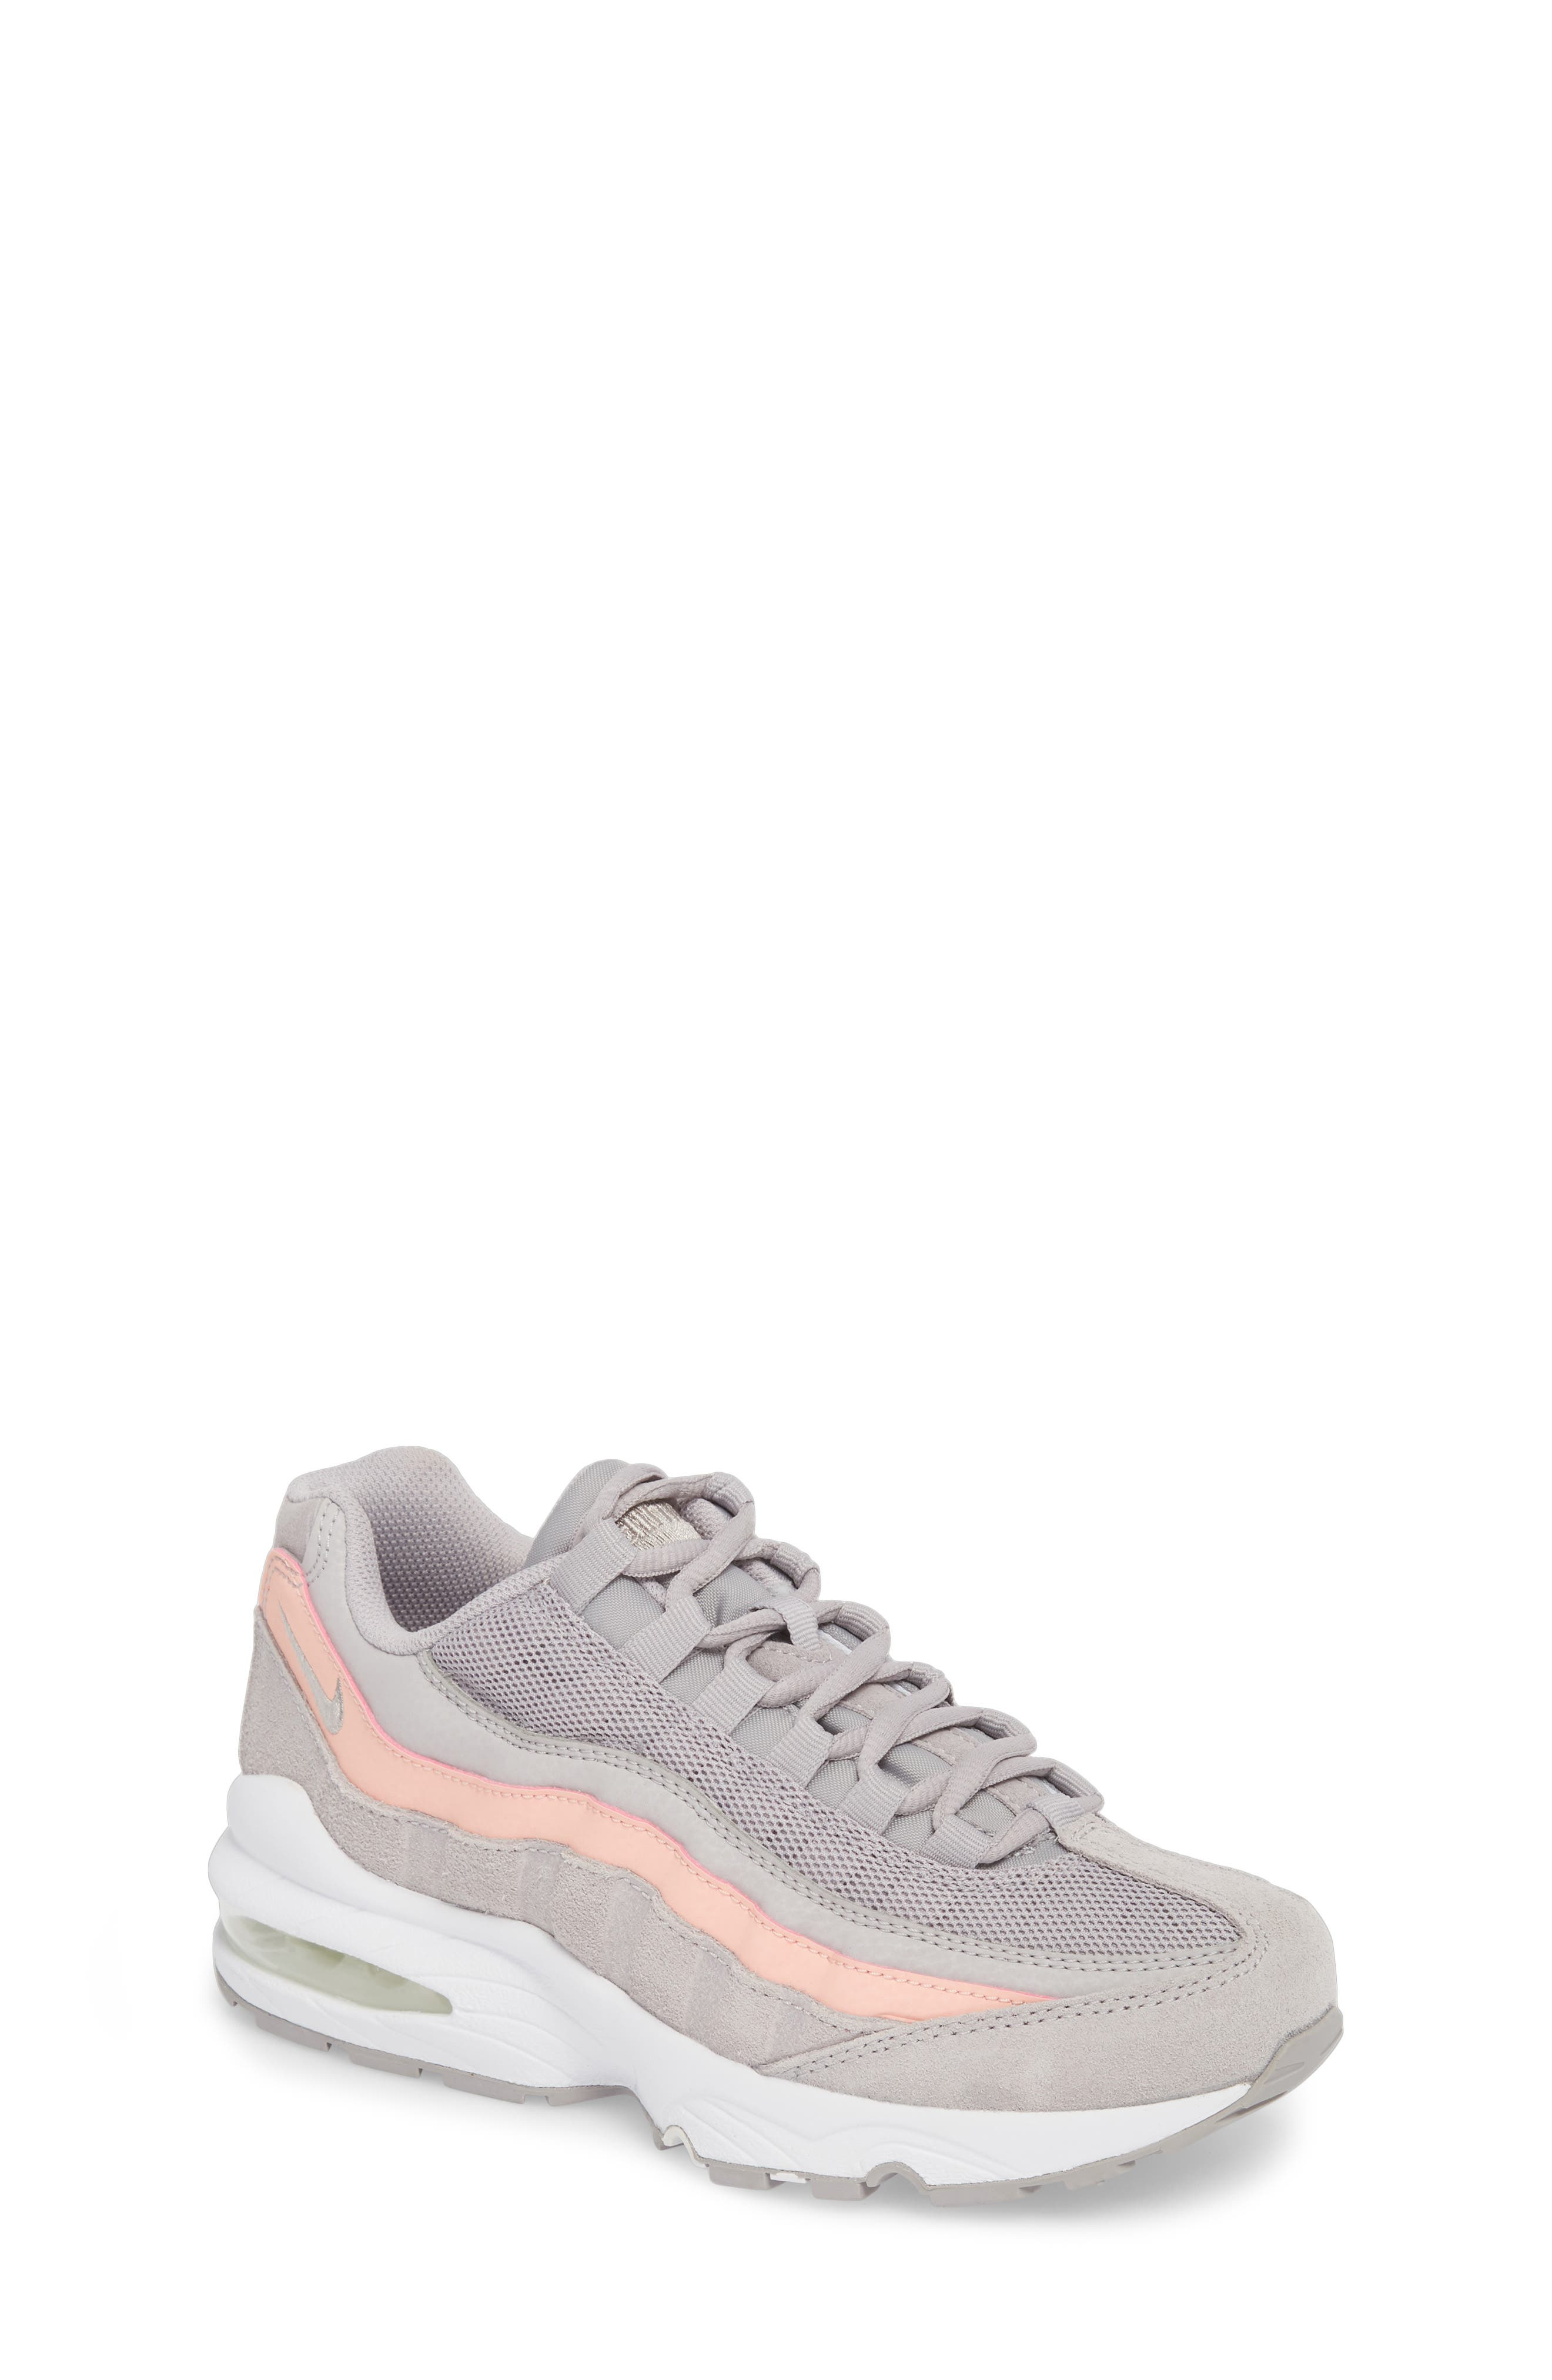 Air Max '95 LE Sneaker,                         Main,                         color, 020